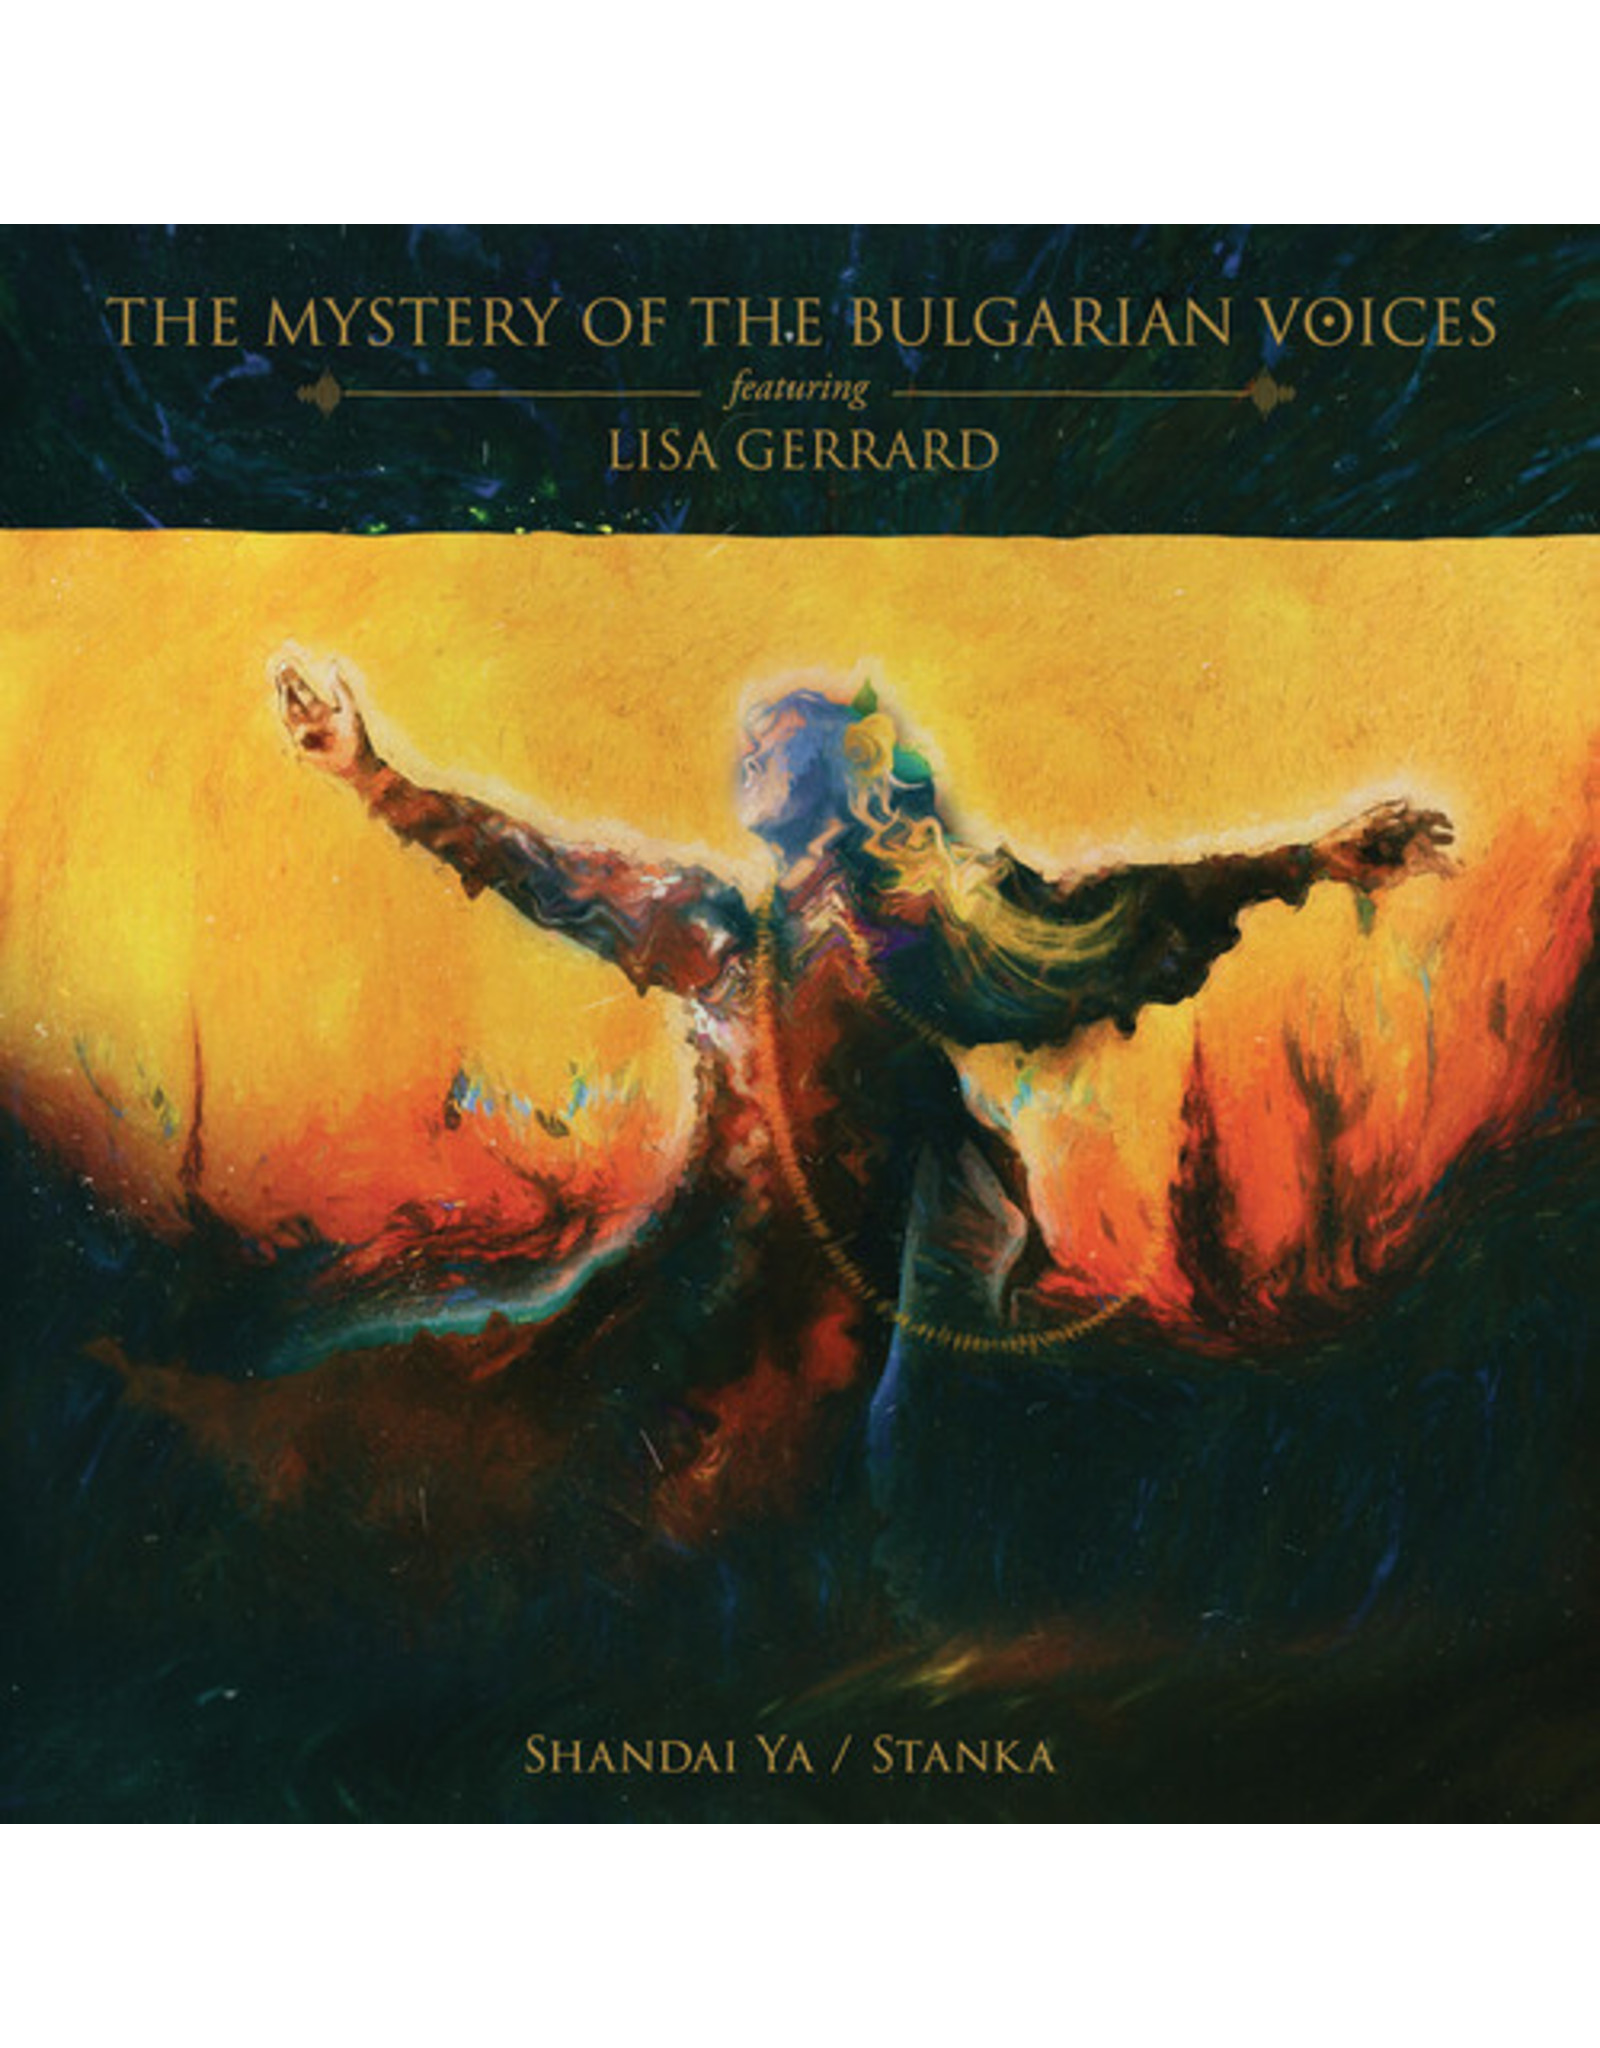 New Vinyl The Mystery Of The Bulgarian Voices Ft. Lisa Gerrard - Shandai Ya / Stanka LP